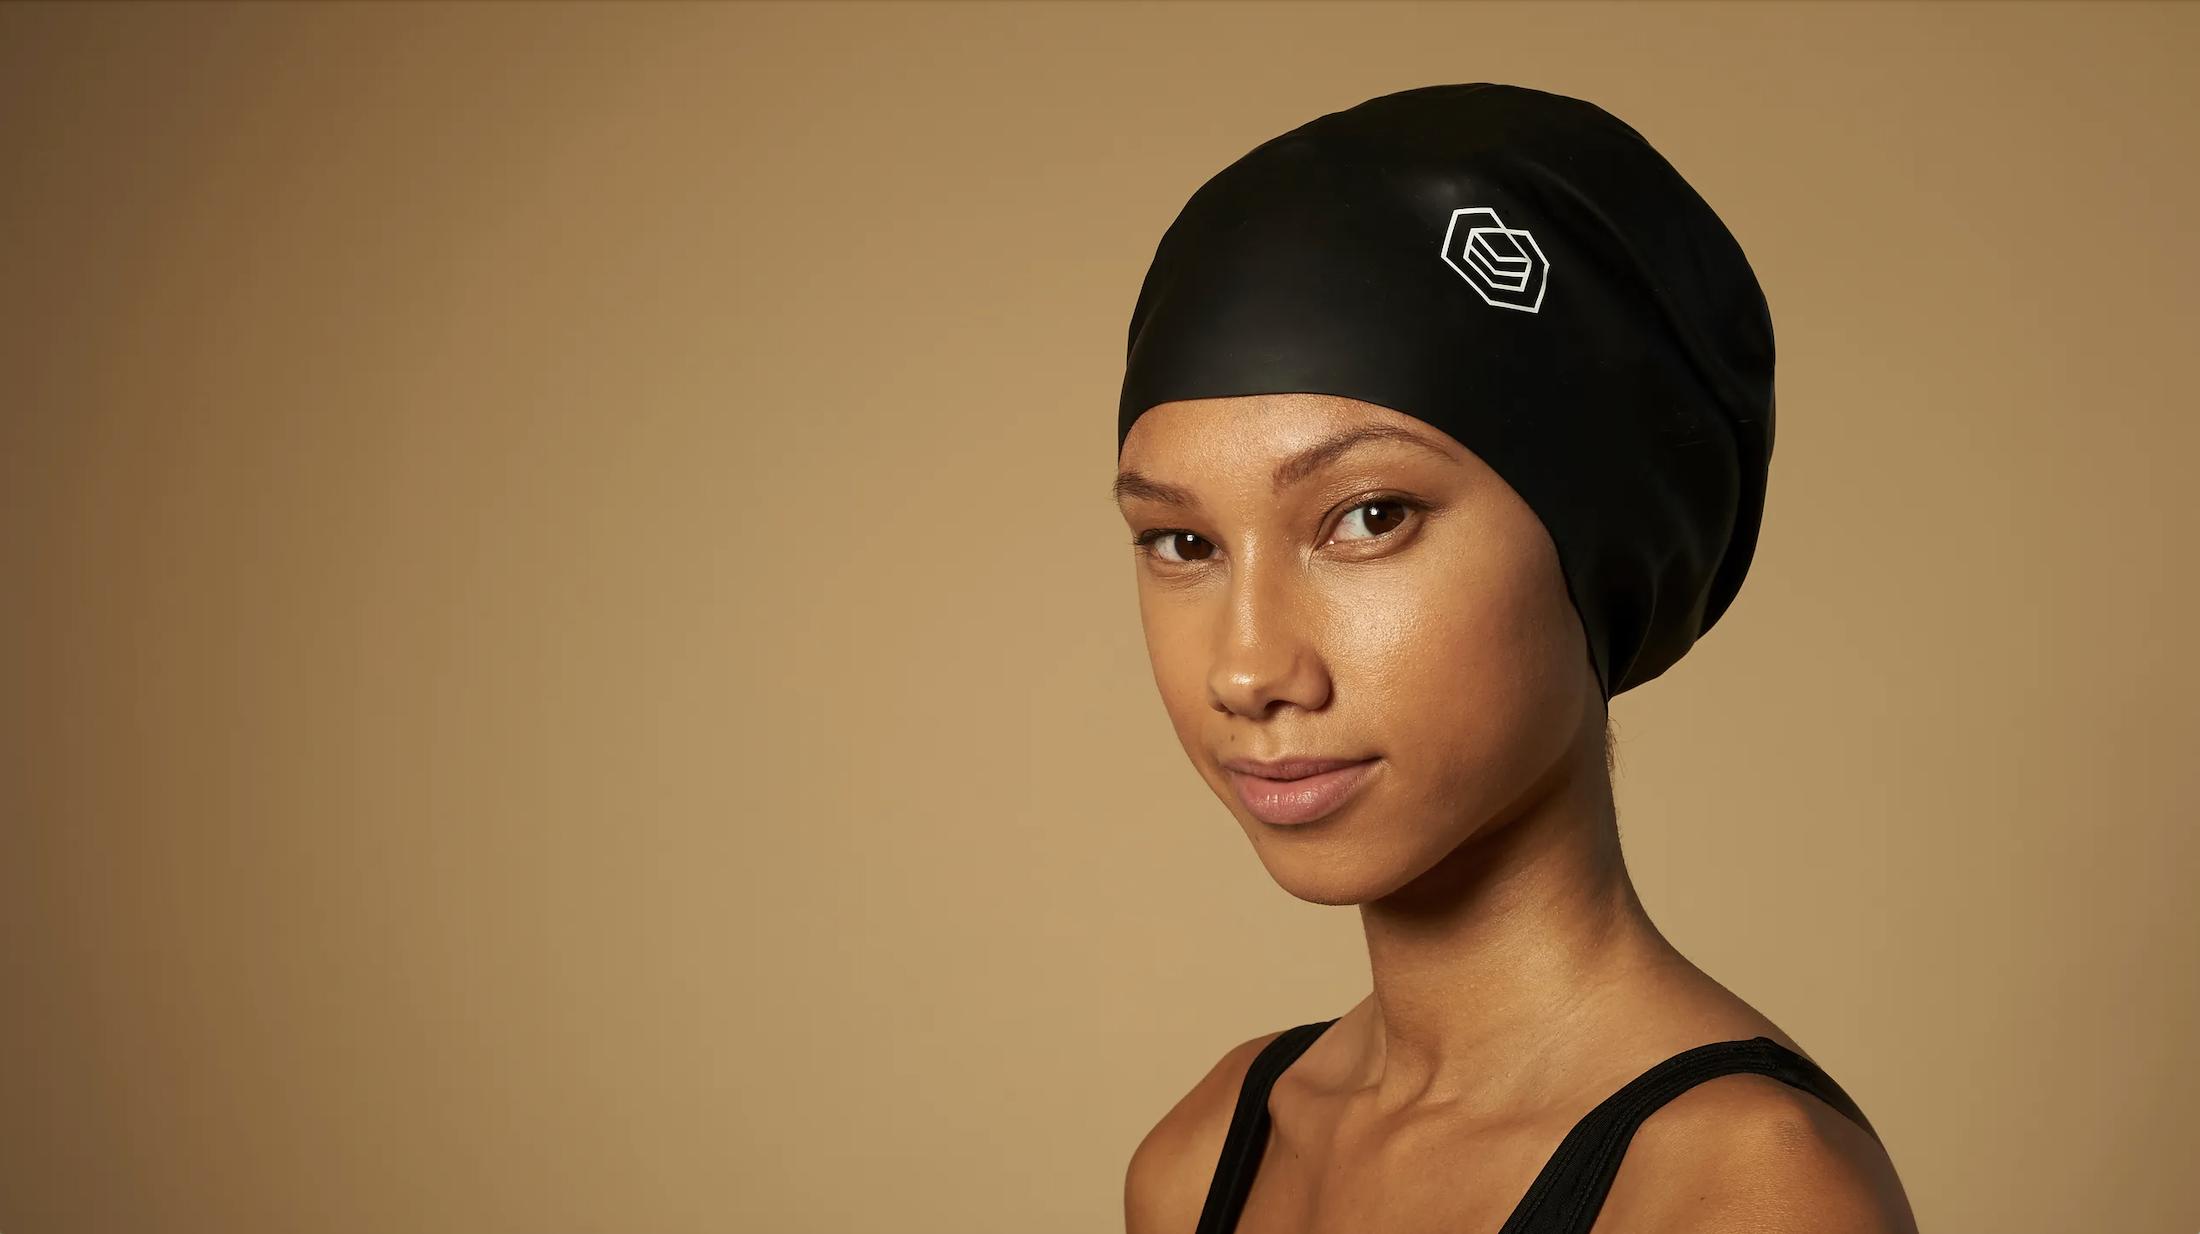 Black swimmer in Soul Cap